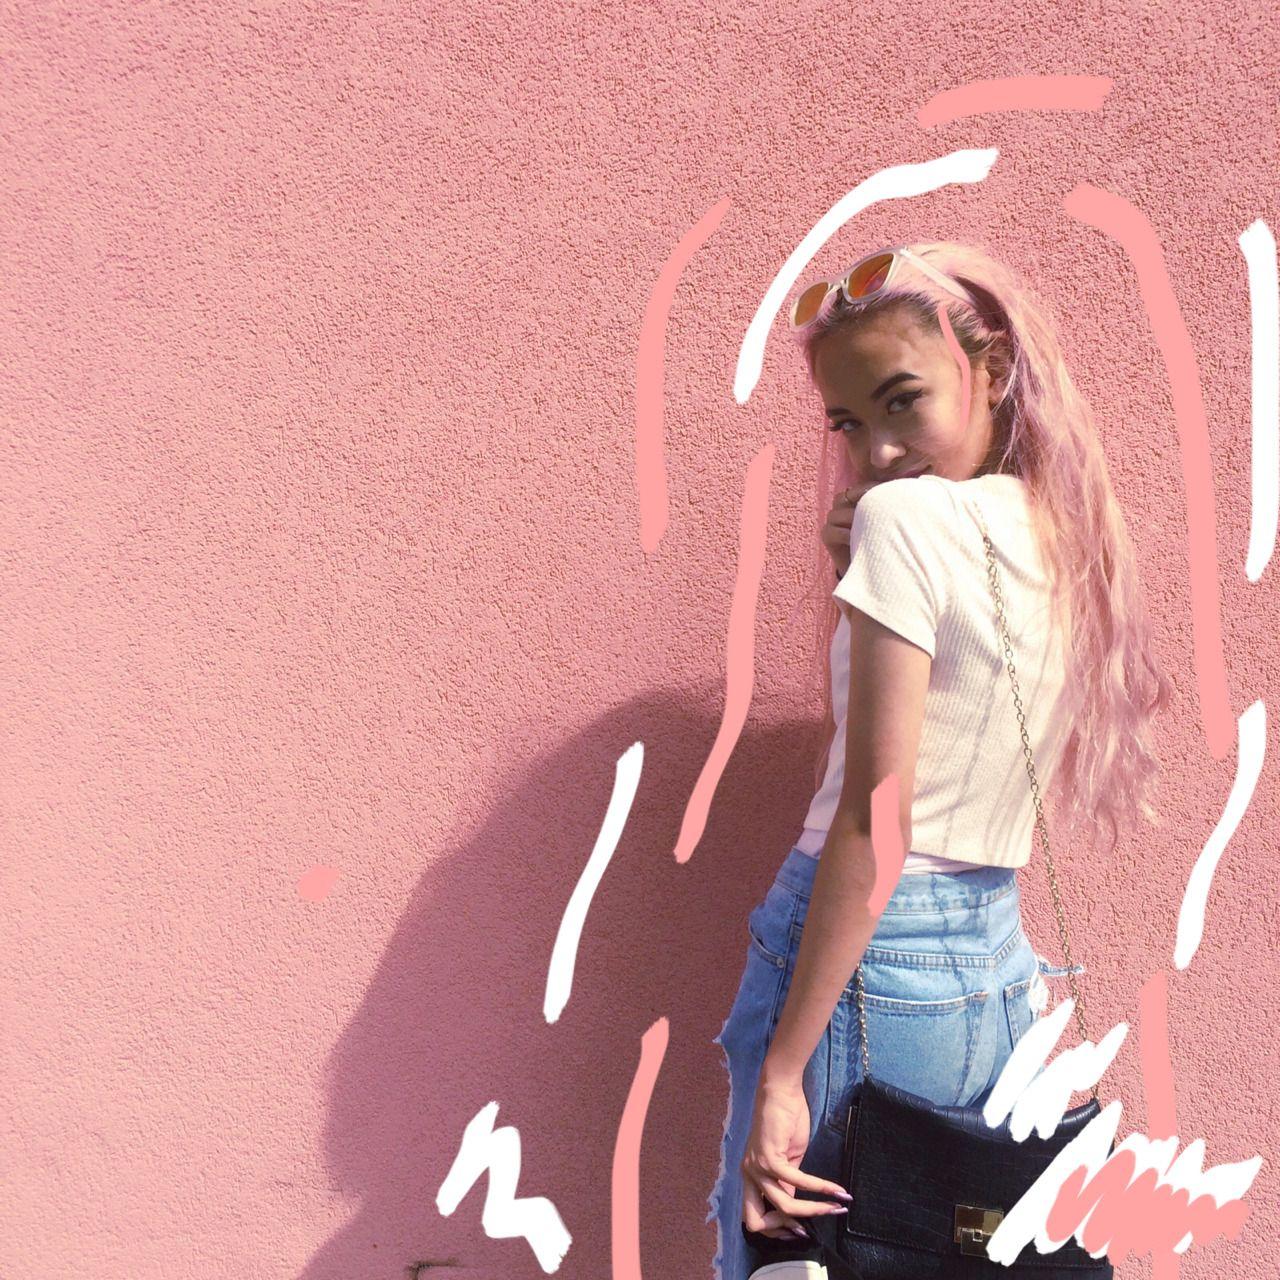 Snapchat Mariana Pinter nude photos 2019